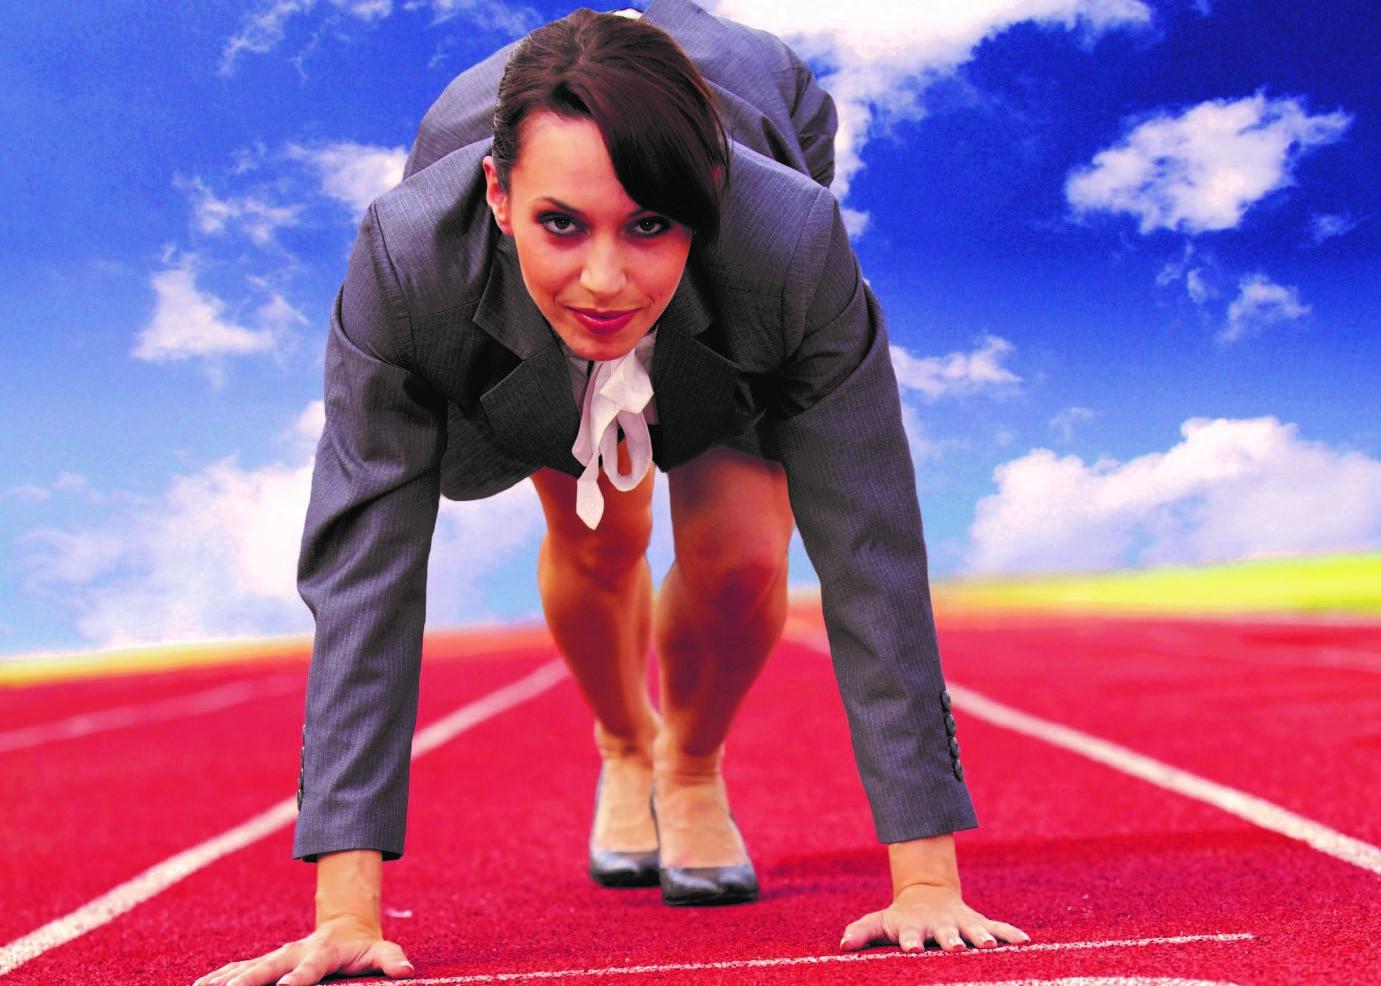 Businesswoman on start line of a running track